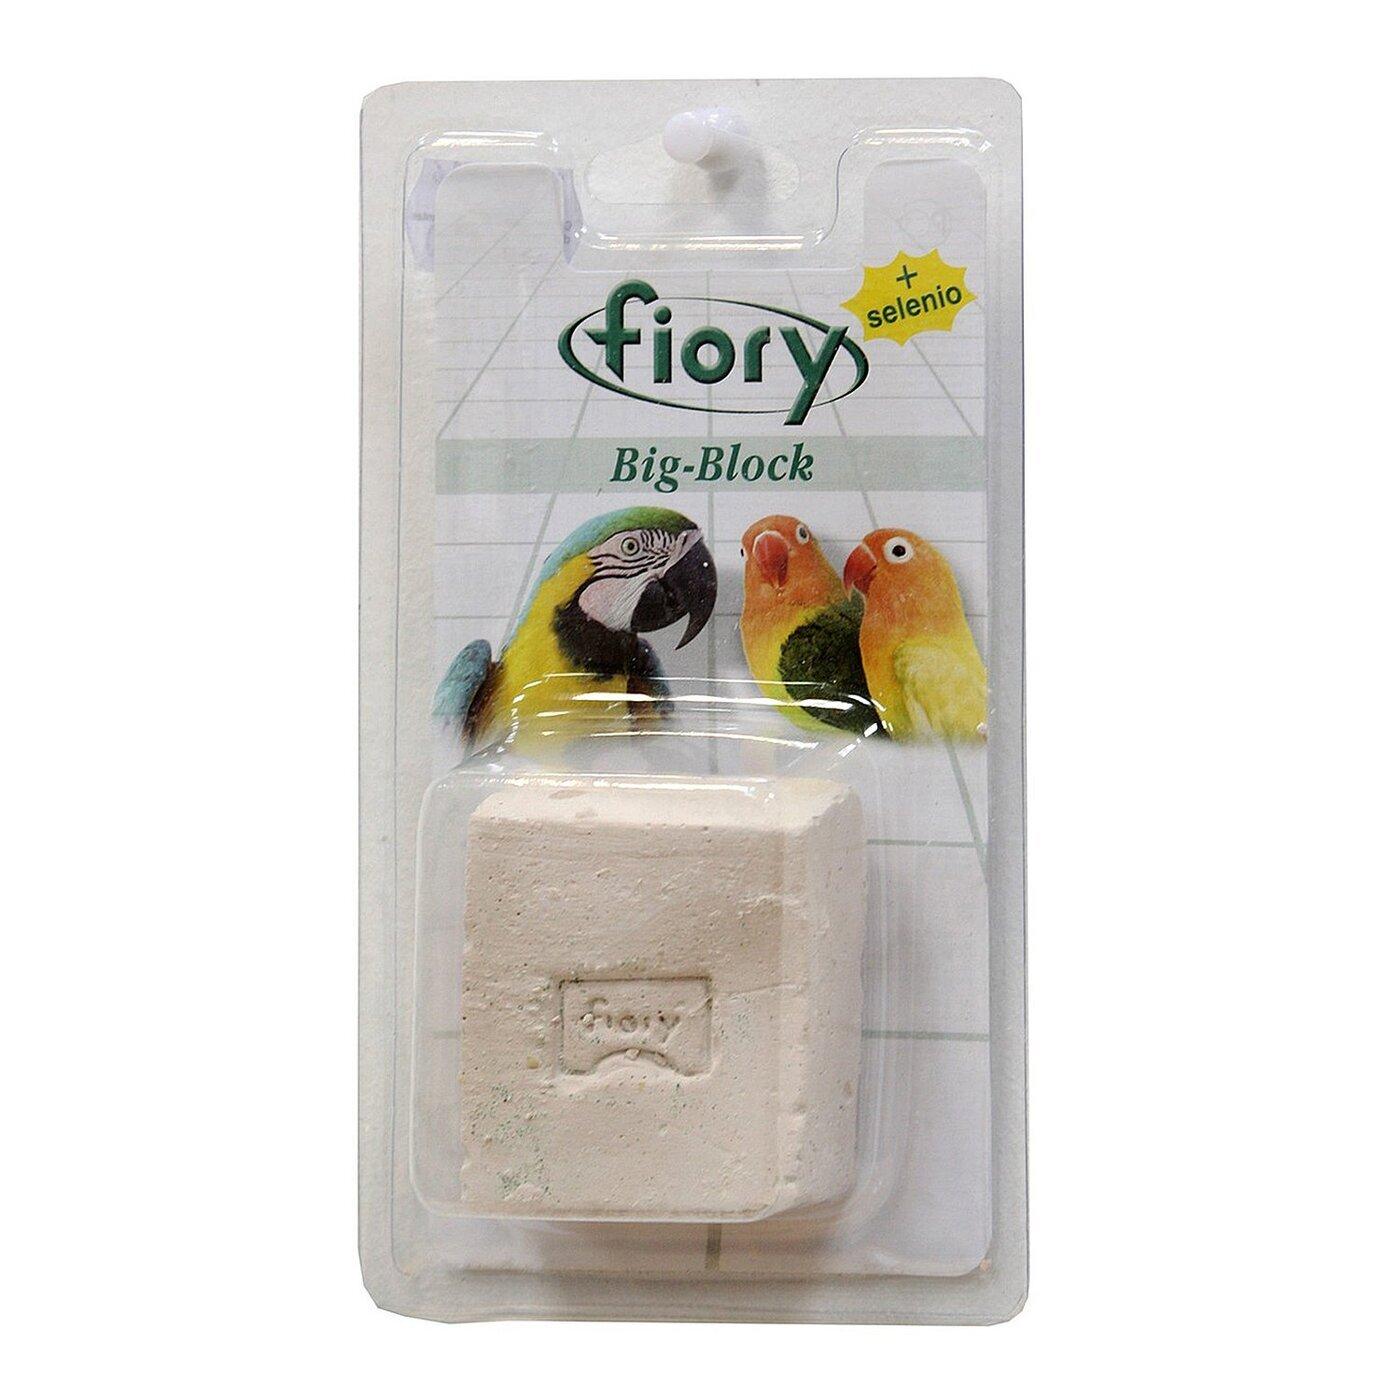 Fiory Big-Block био-камень для птиц, с селеном 100 гр